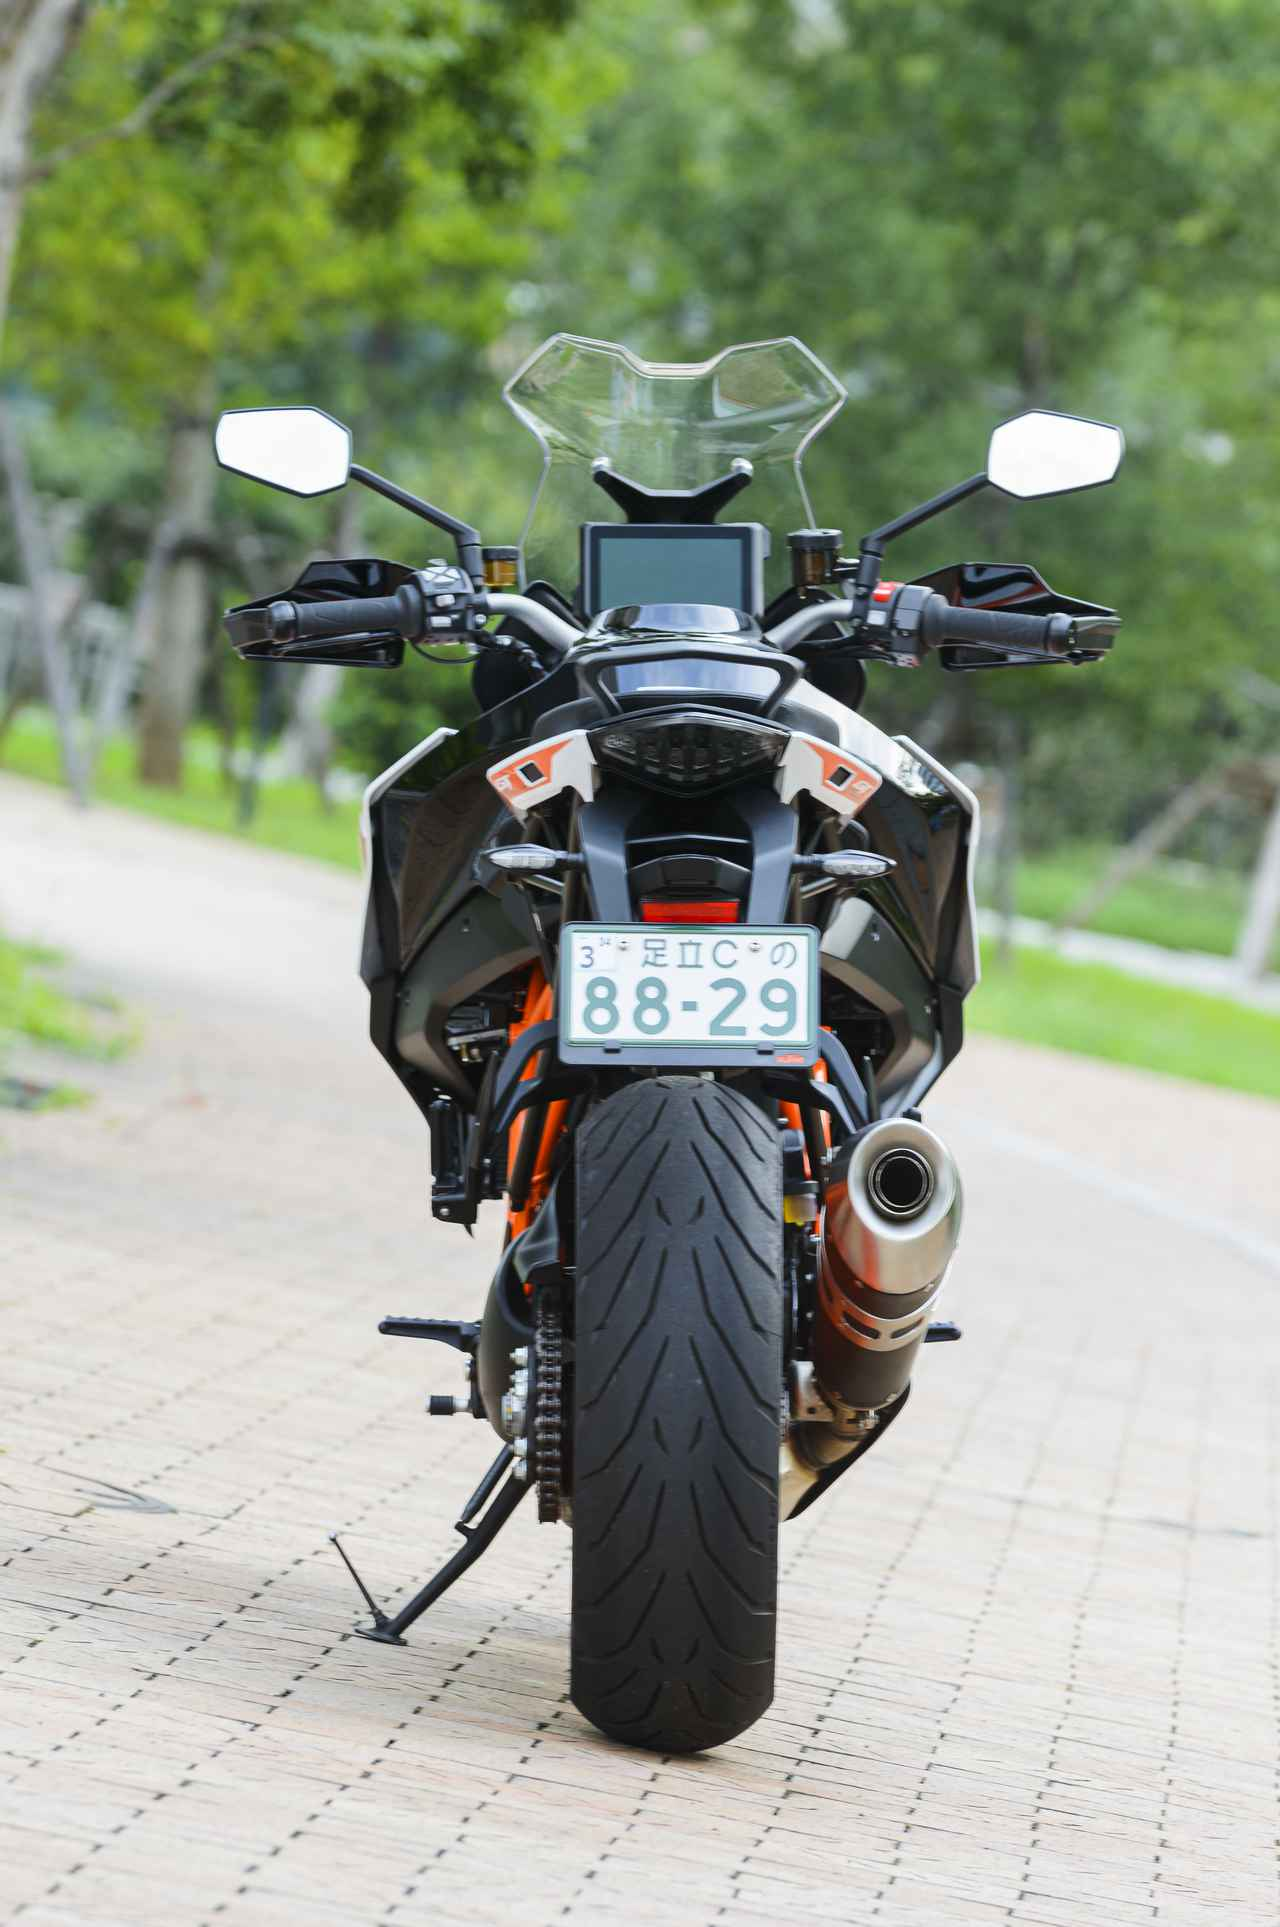 Images : 6番目の画像 - KTM 1290 SUPER DUKE GT 写真をまとめて見る! - webオートバイ